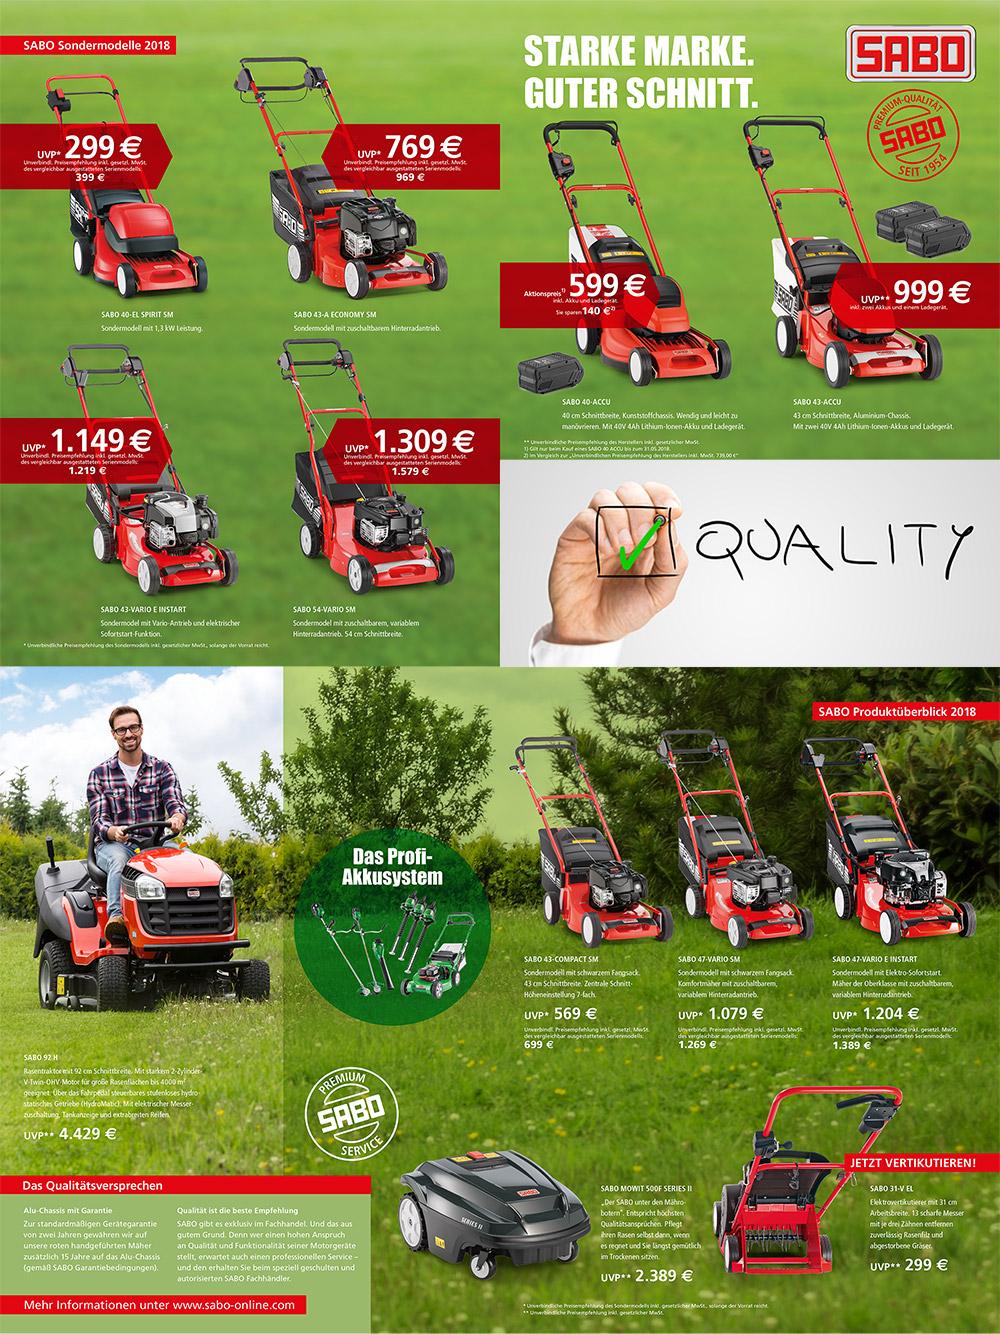 Sabo Werbe Aktion für Profi-Rasenmäher